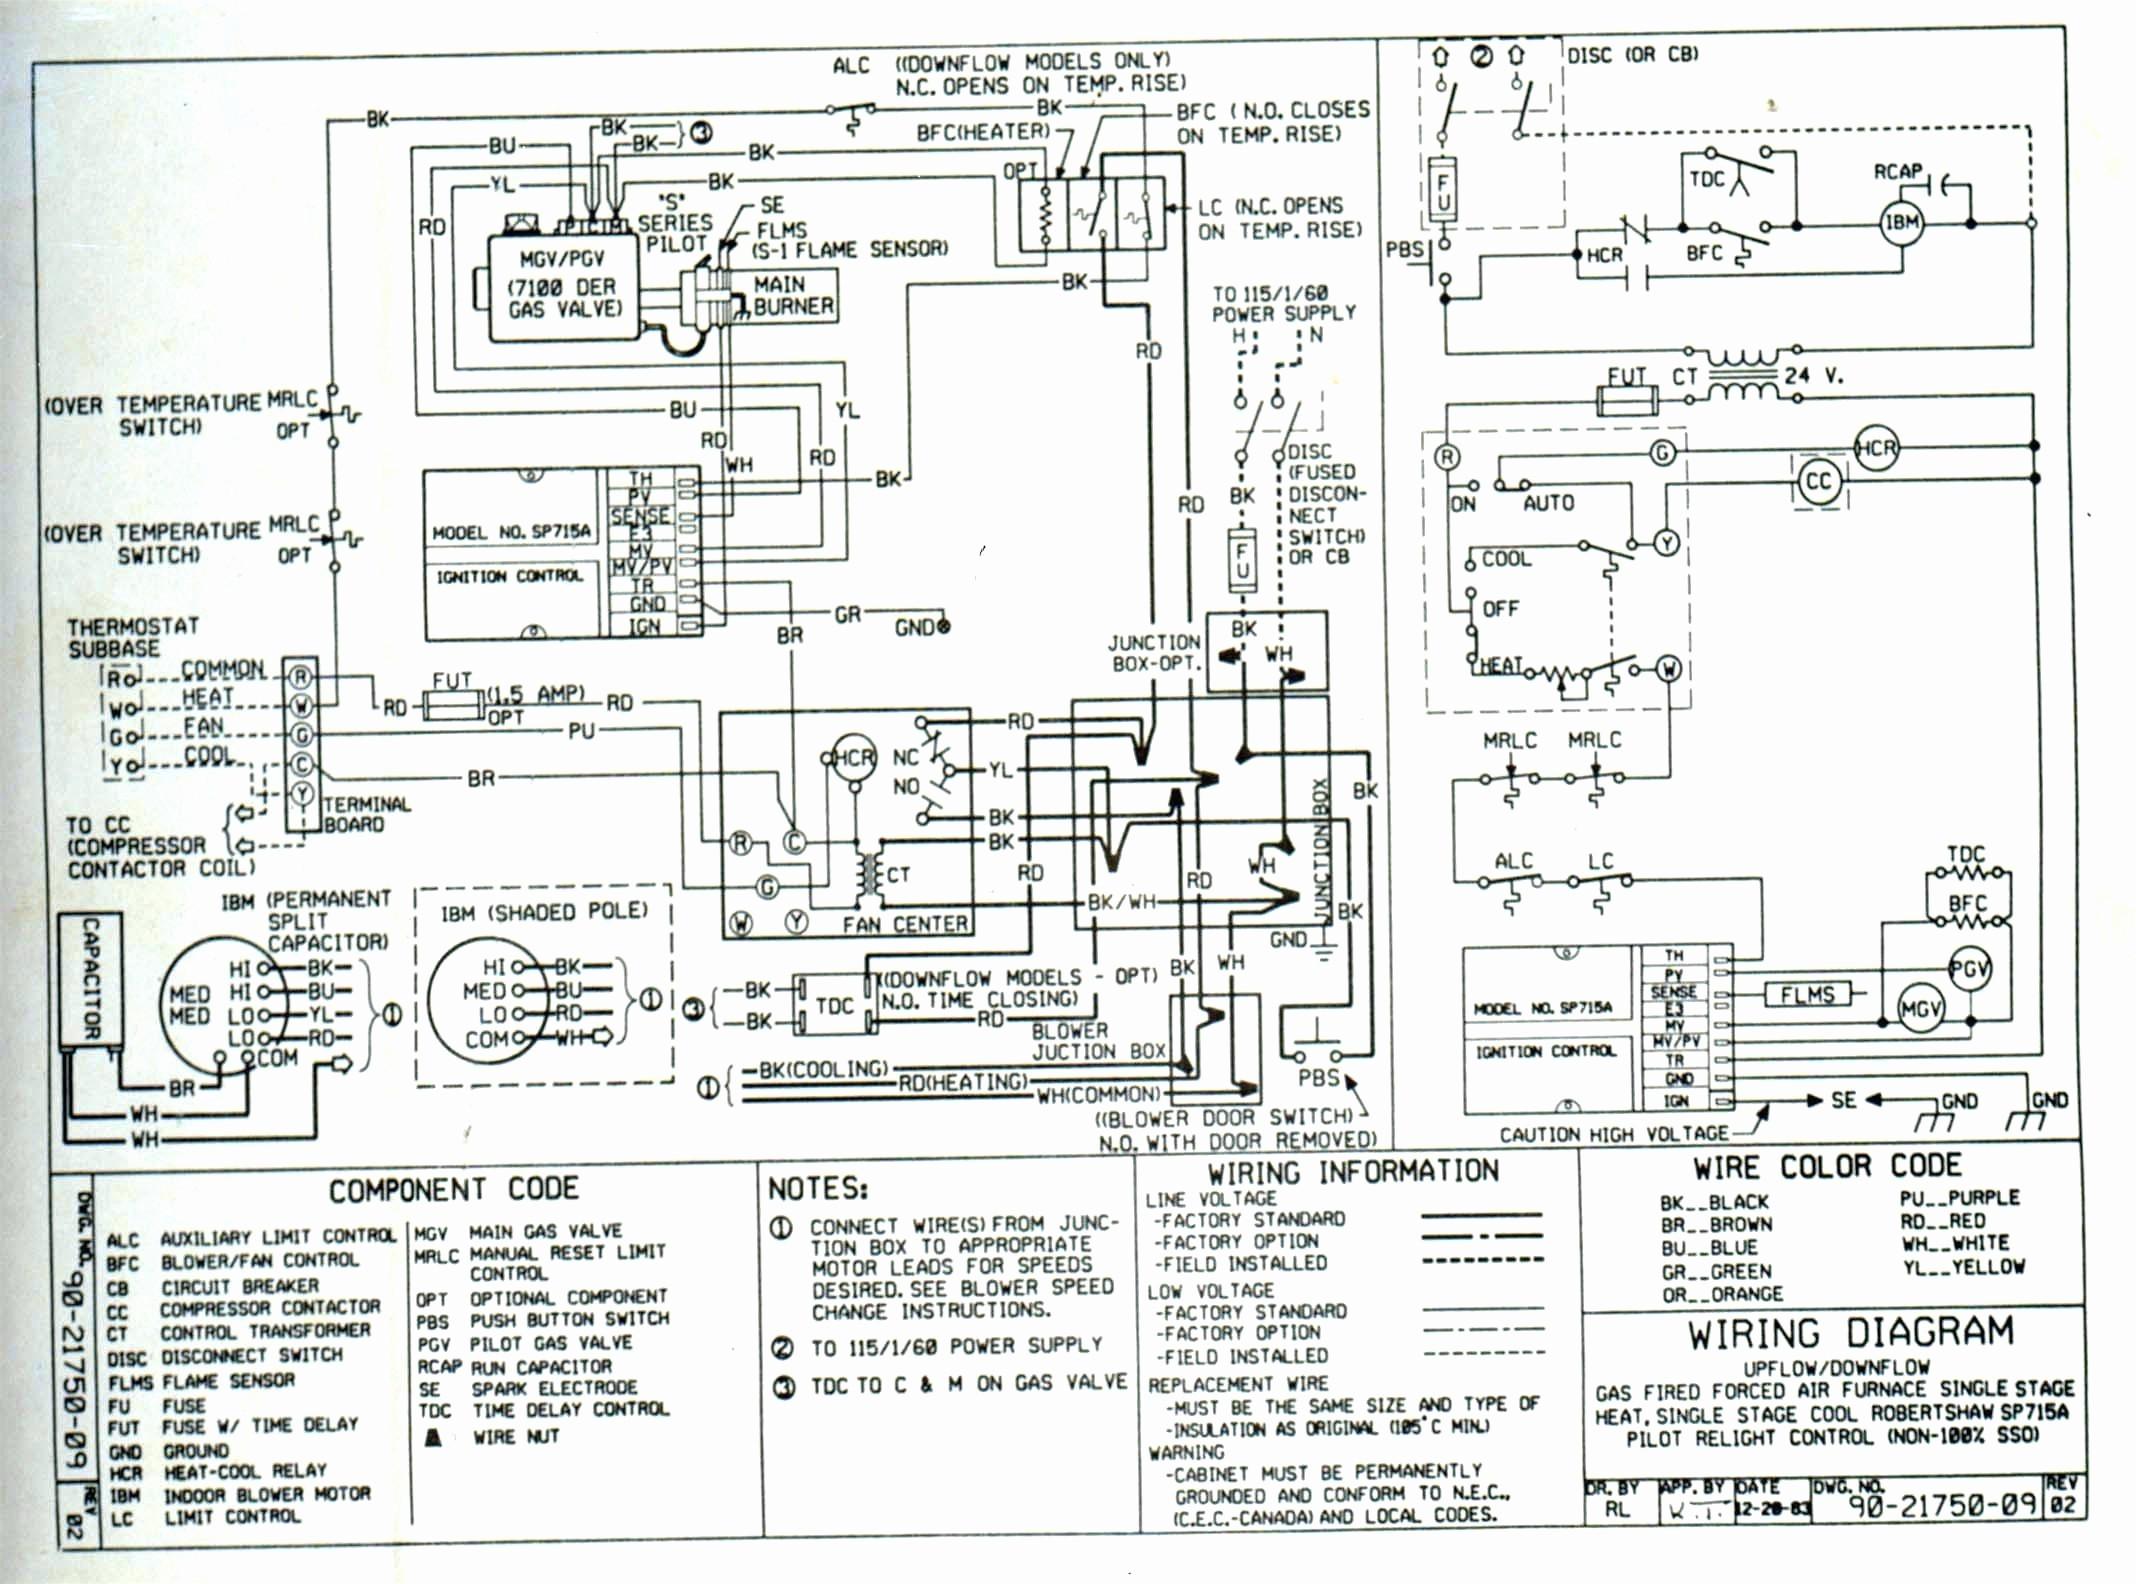 leeson dc motor wiring diagram online wiring diagram